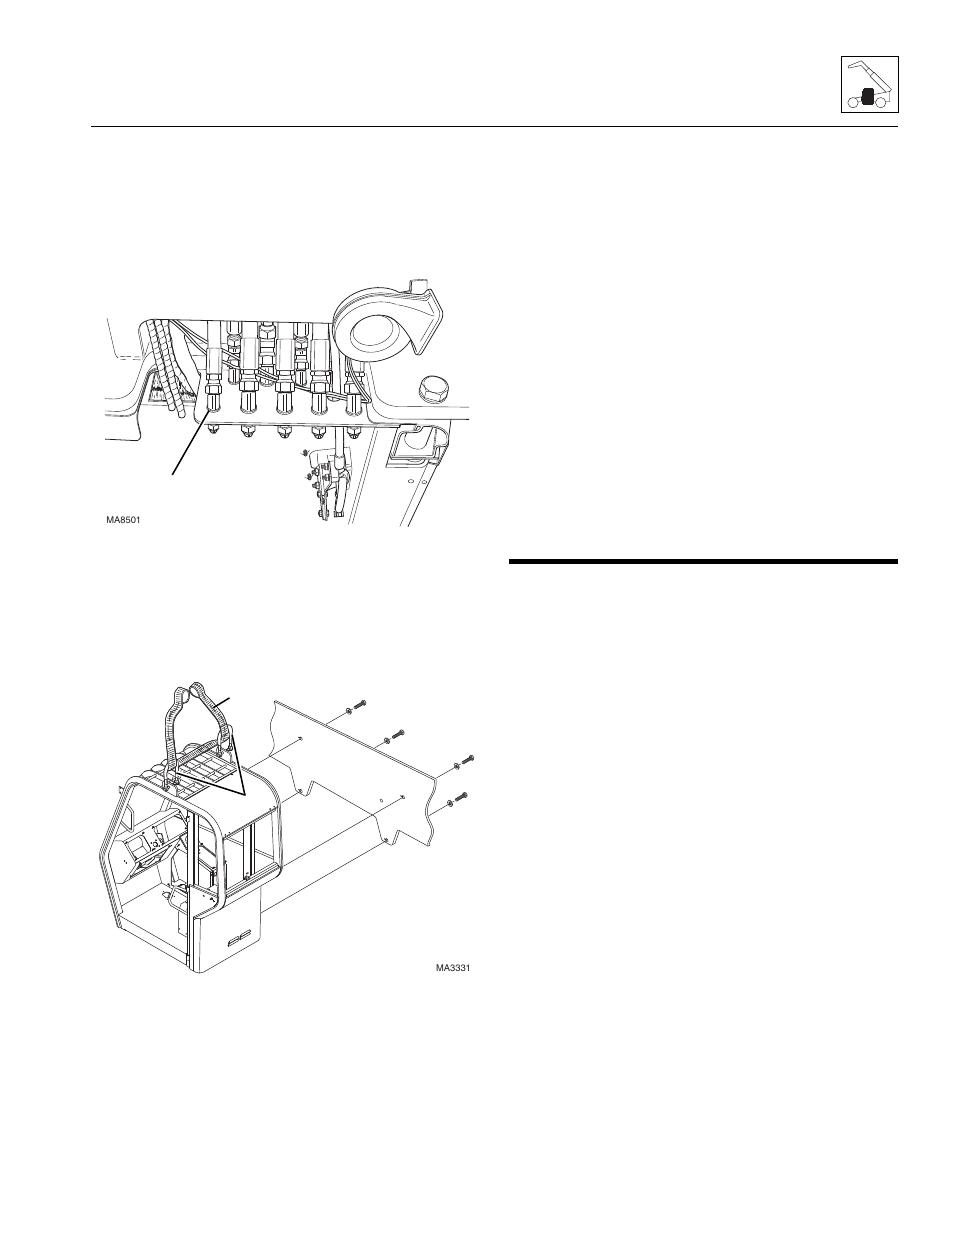 Skytrak 8042 Wiring Diagram Yale Glp060 Jcb 506c 5 Cab Installation Service Manual On